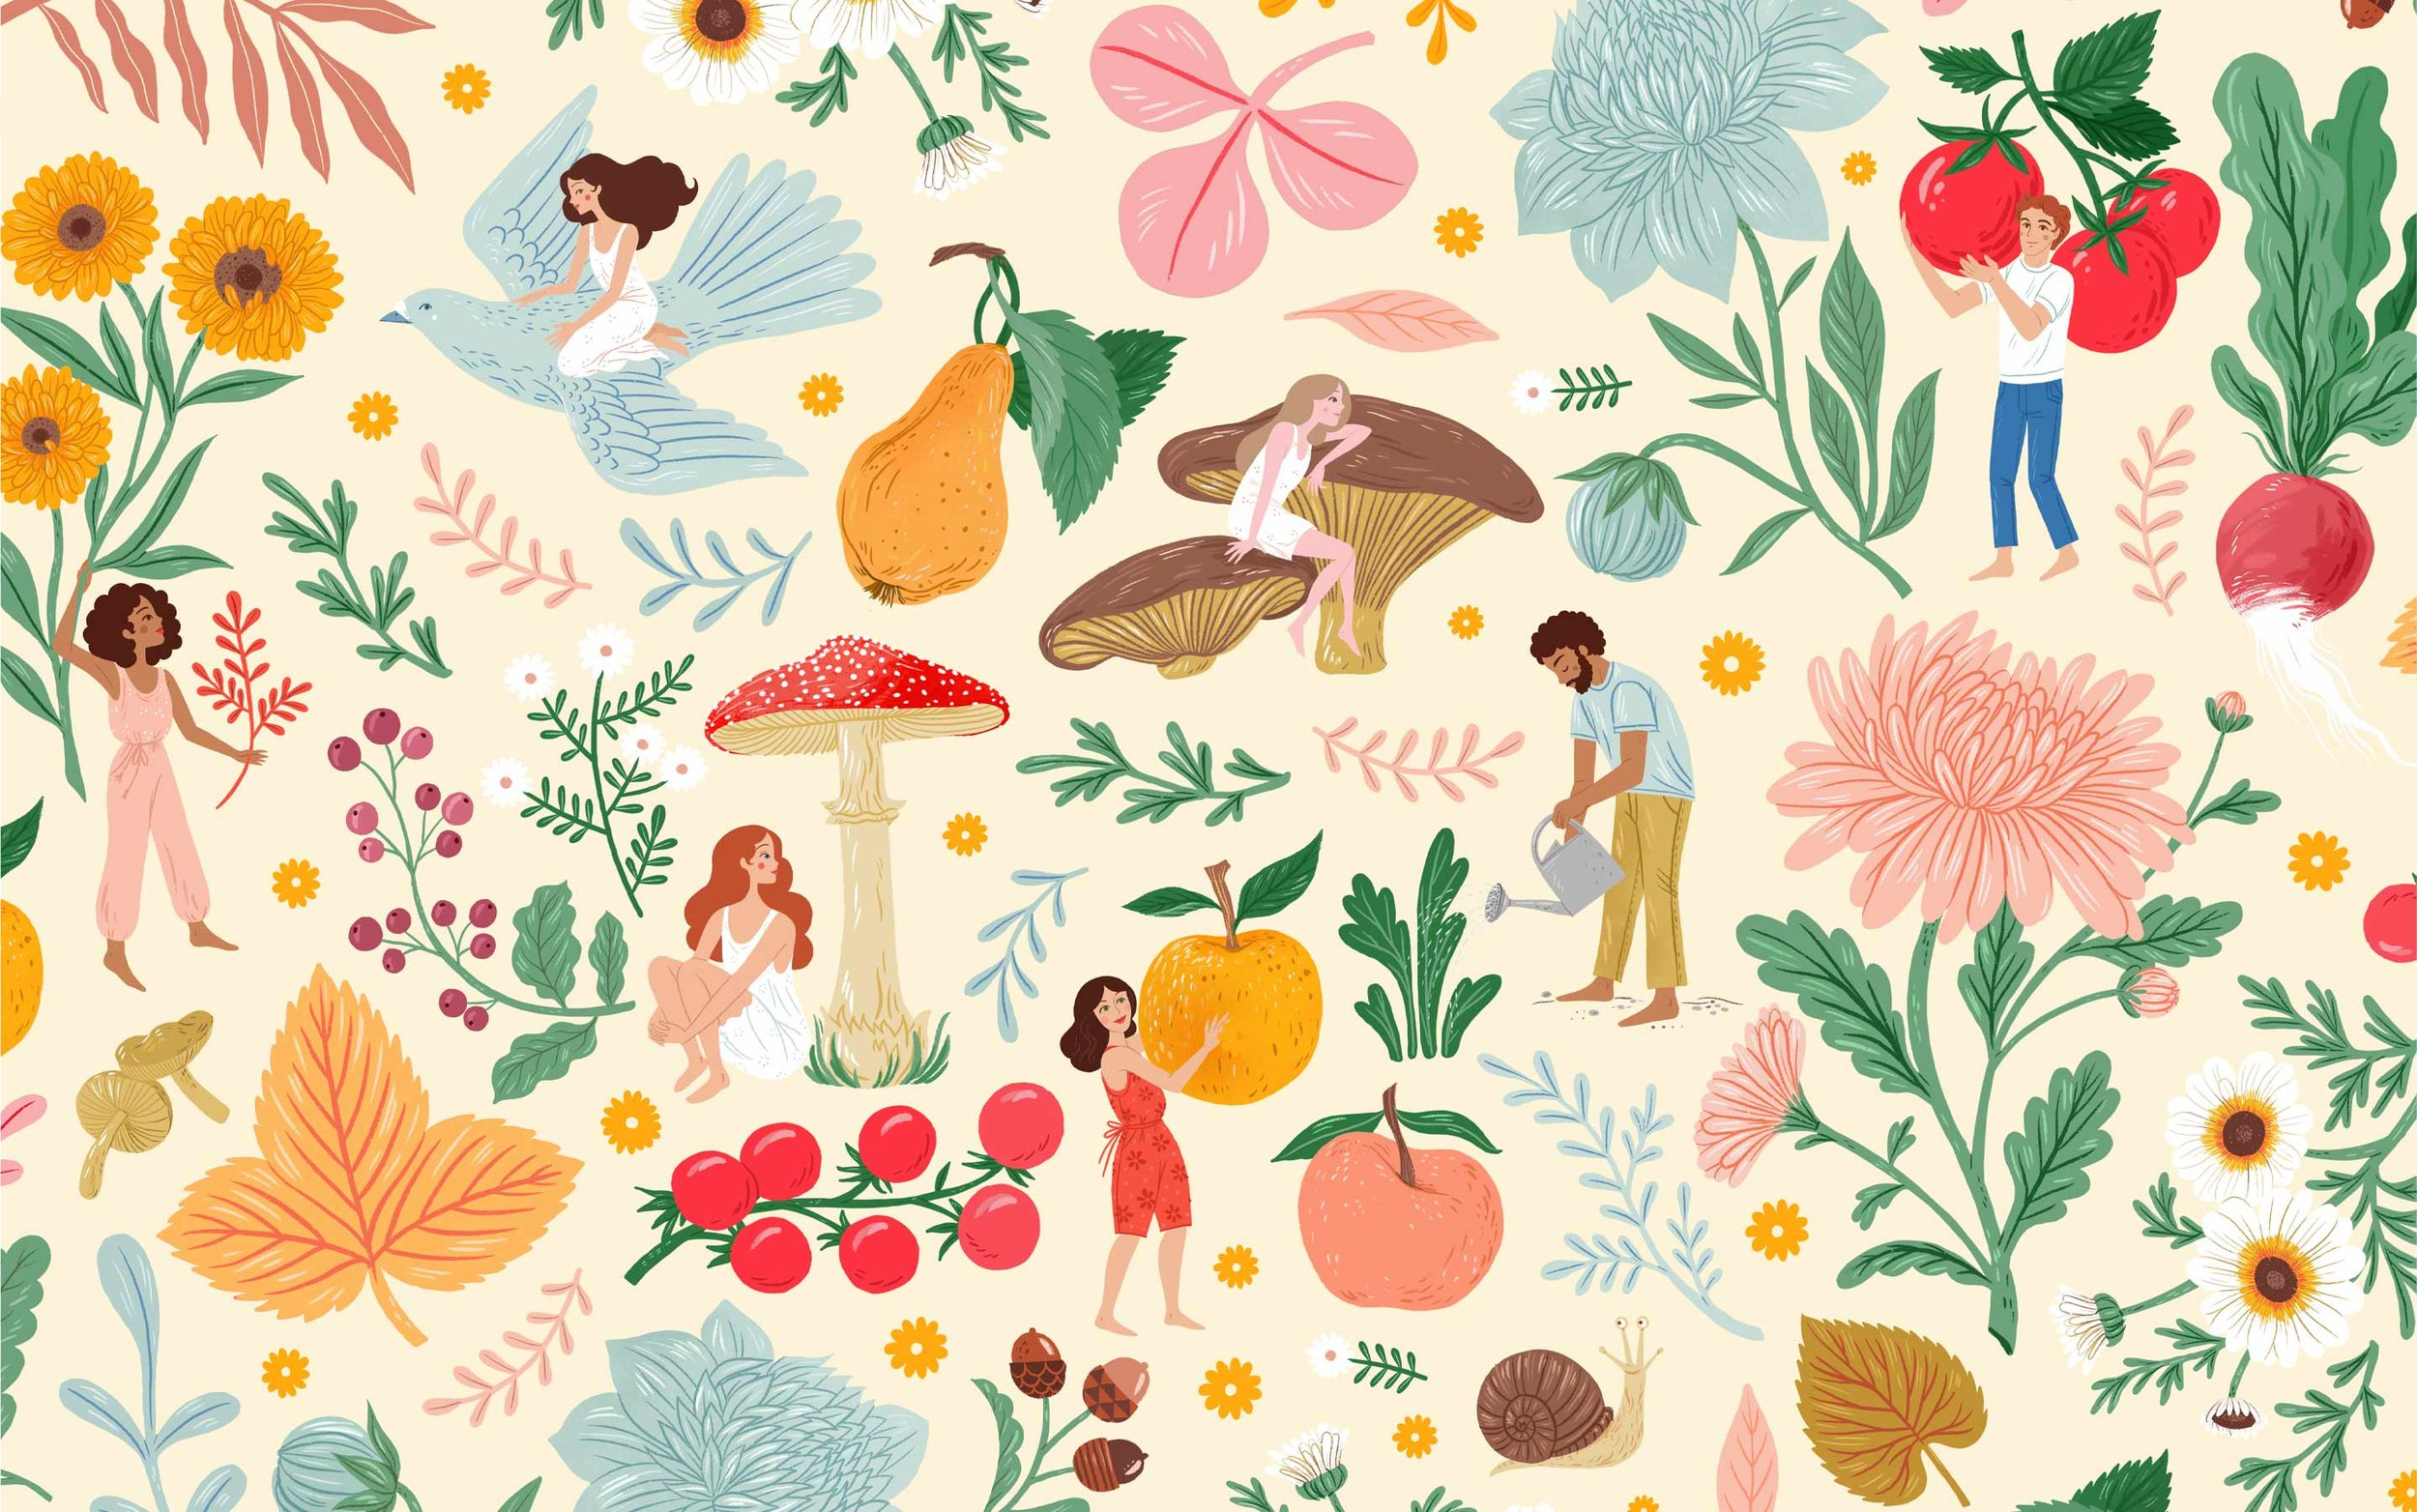 Wallpaper---Oana-Sept-19-Small-File.jpg